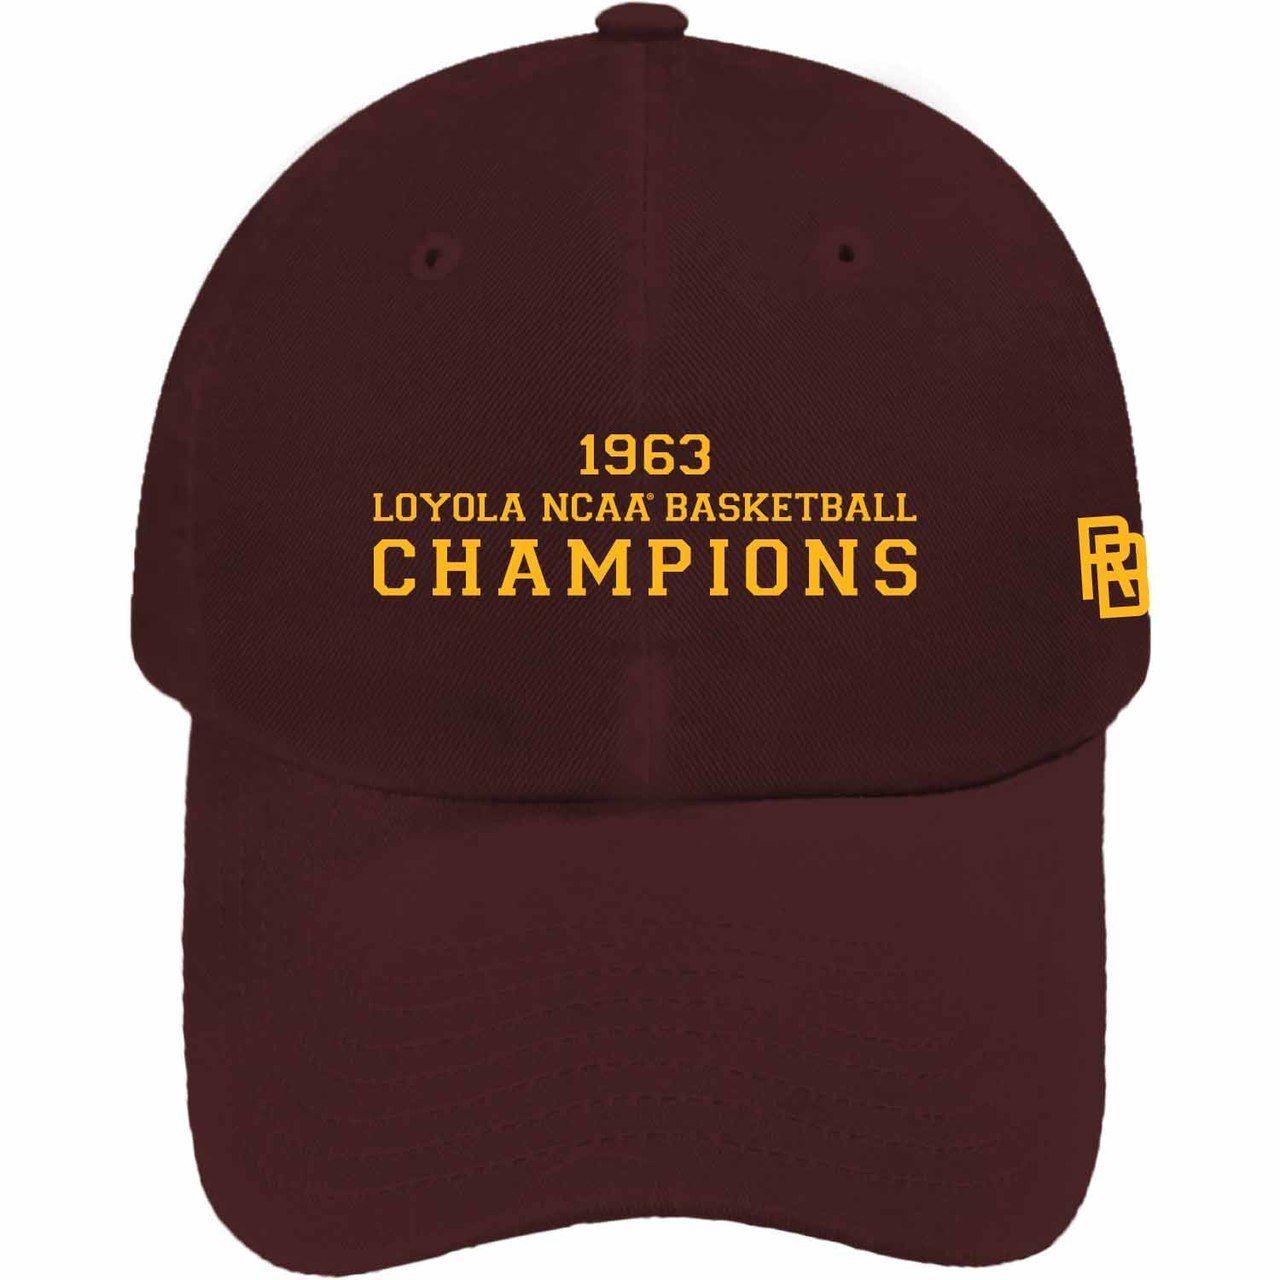 wholesale loyola ramblers hat 459df 4c736